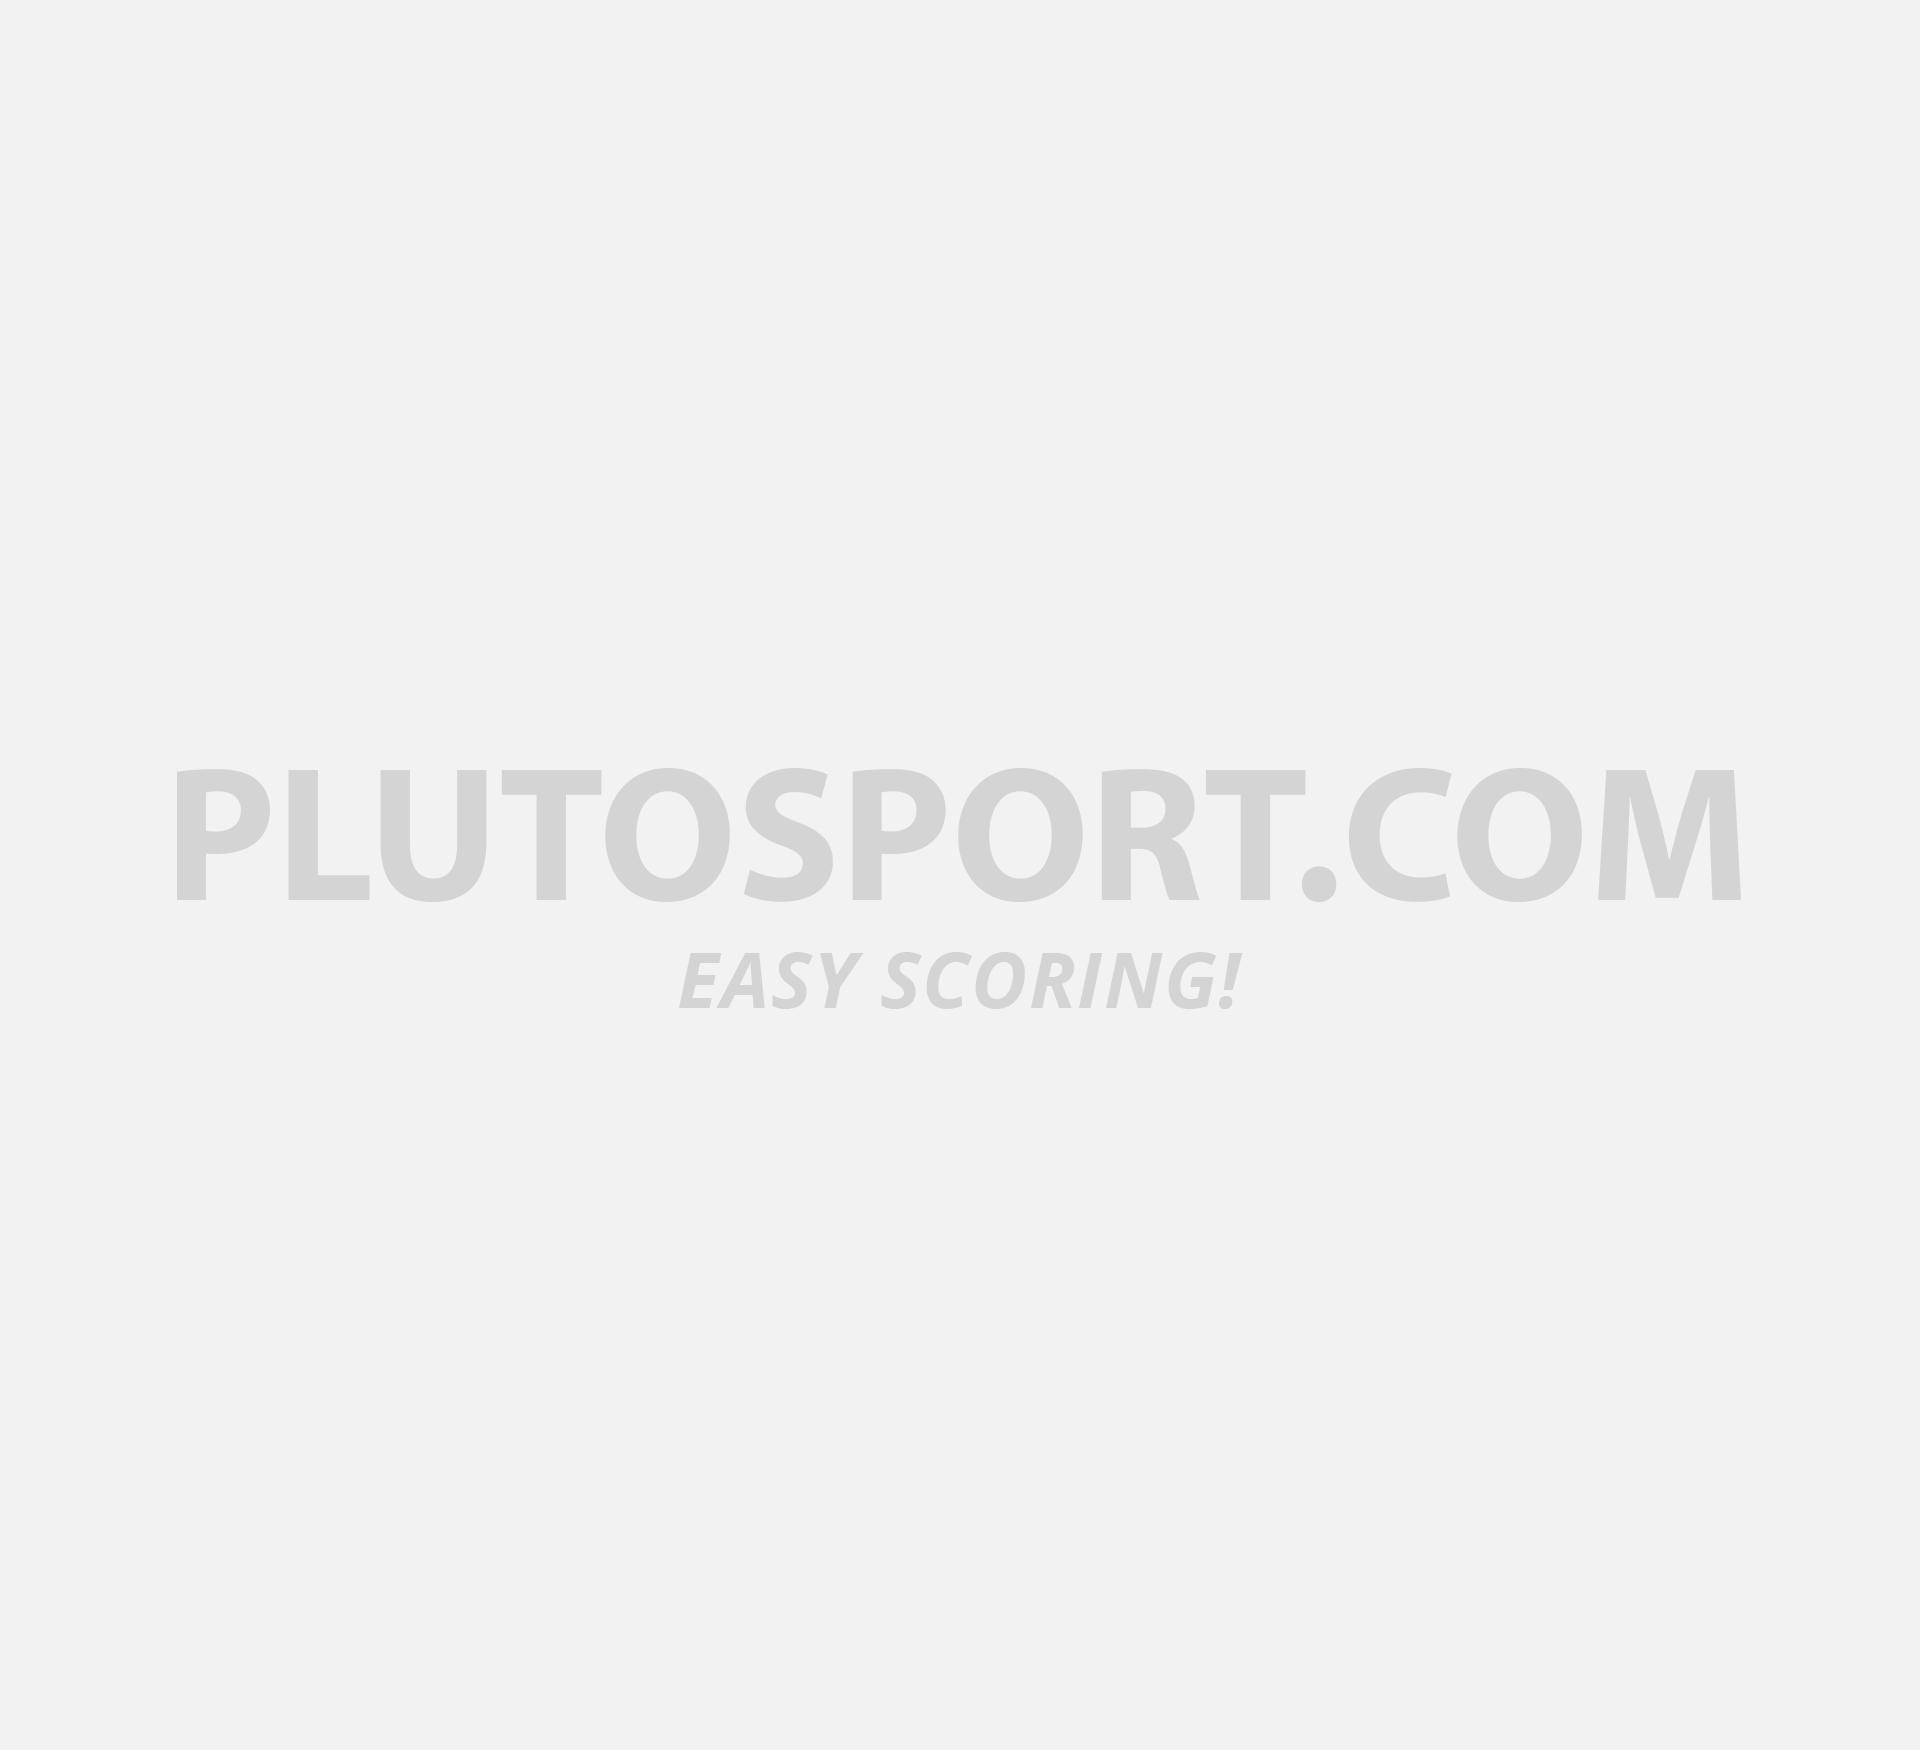 Merrel Vapor Glove 3 Trailrunning Shoe Women